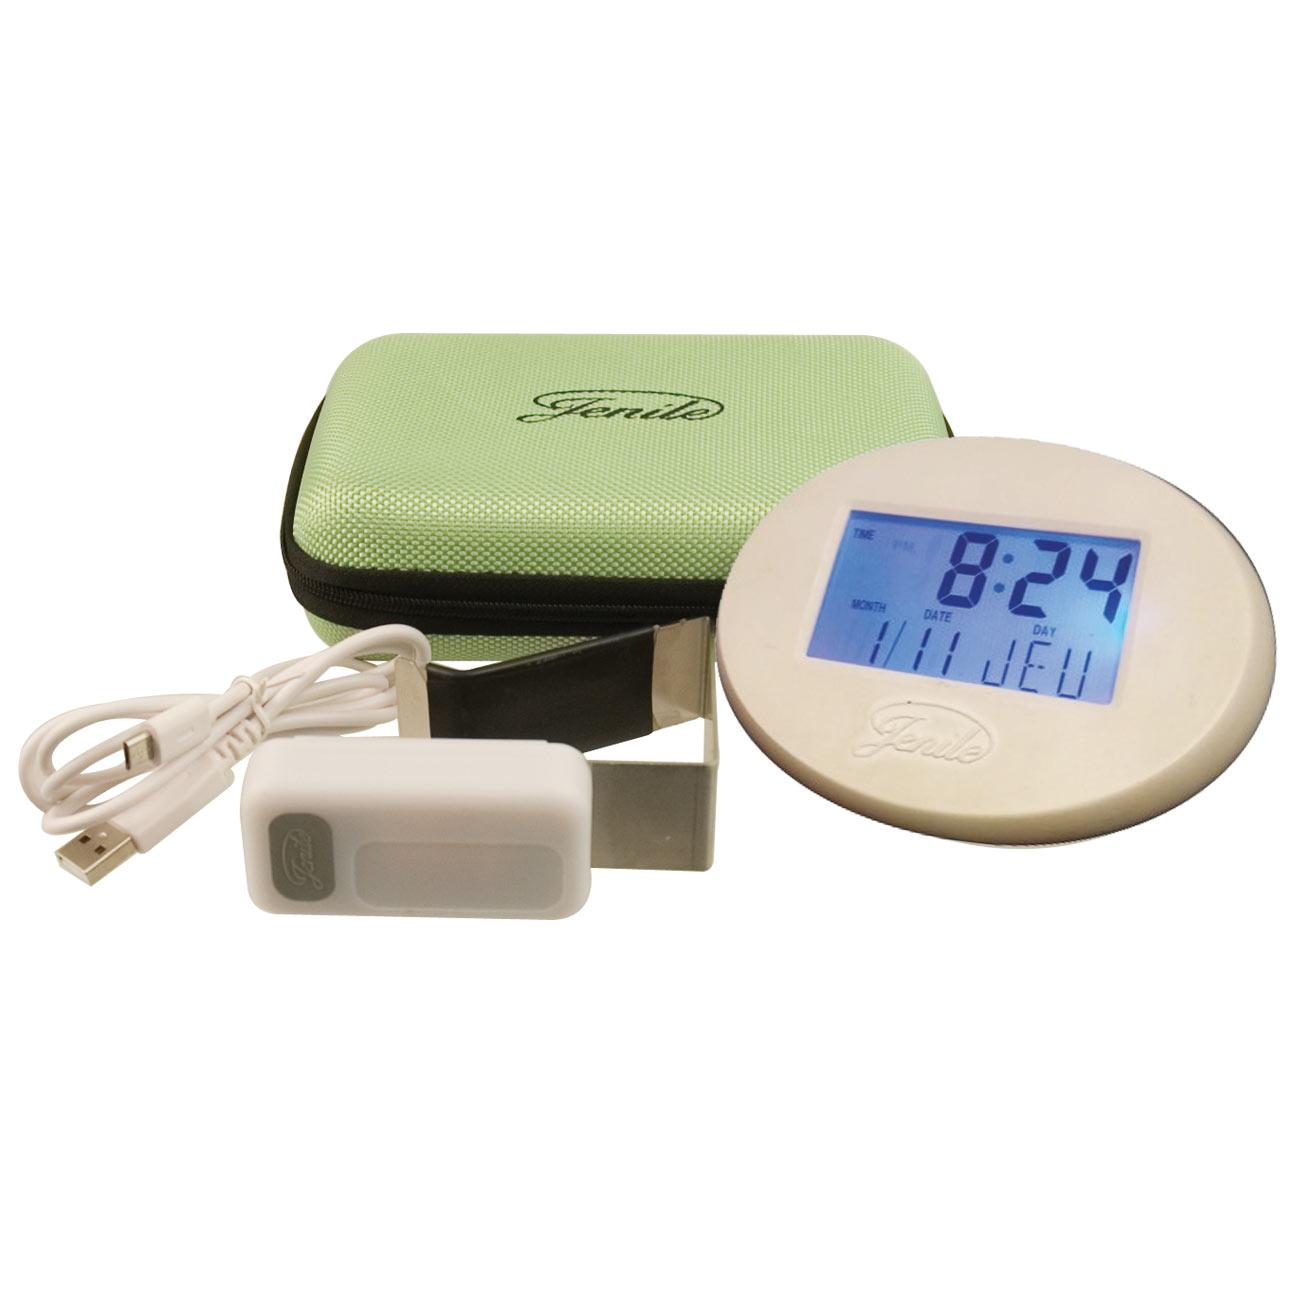 Jenile Portable Wireless Doorbell Alarm Clock Travel Pack